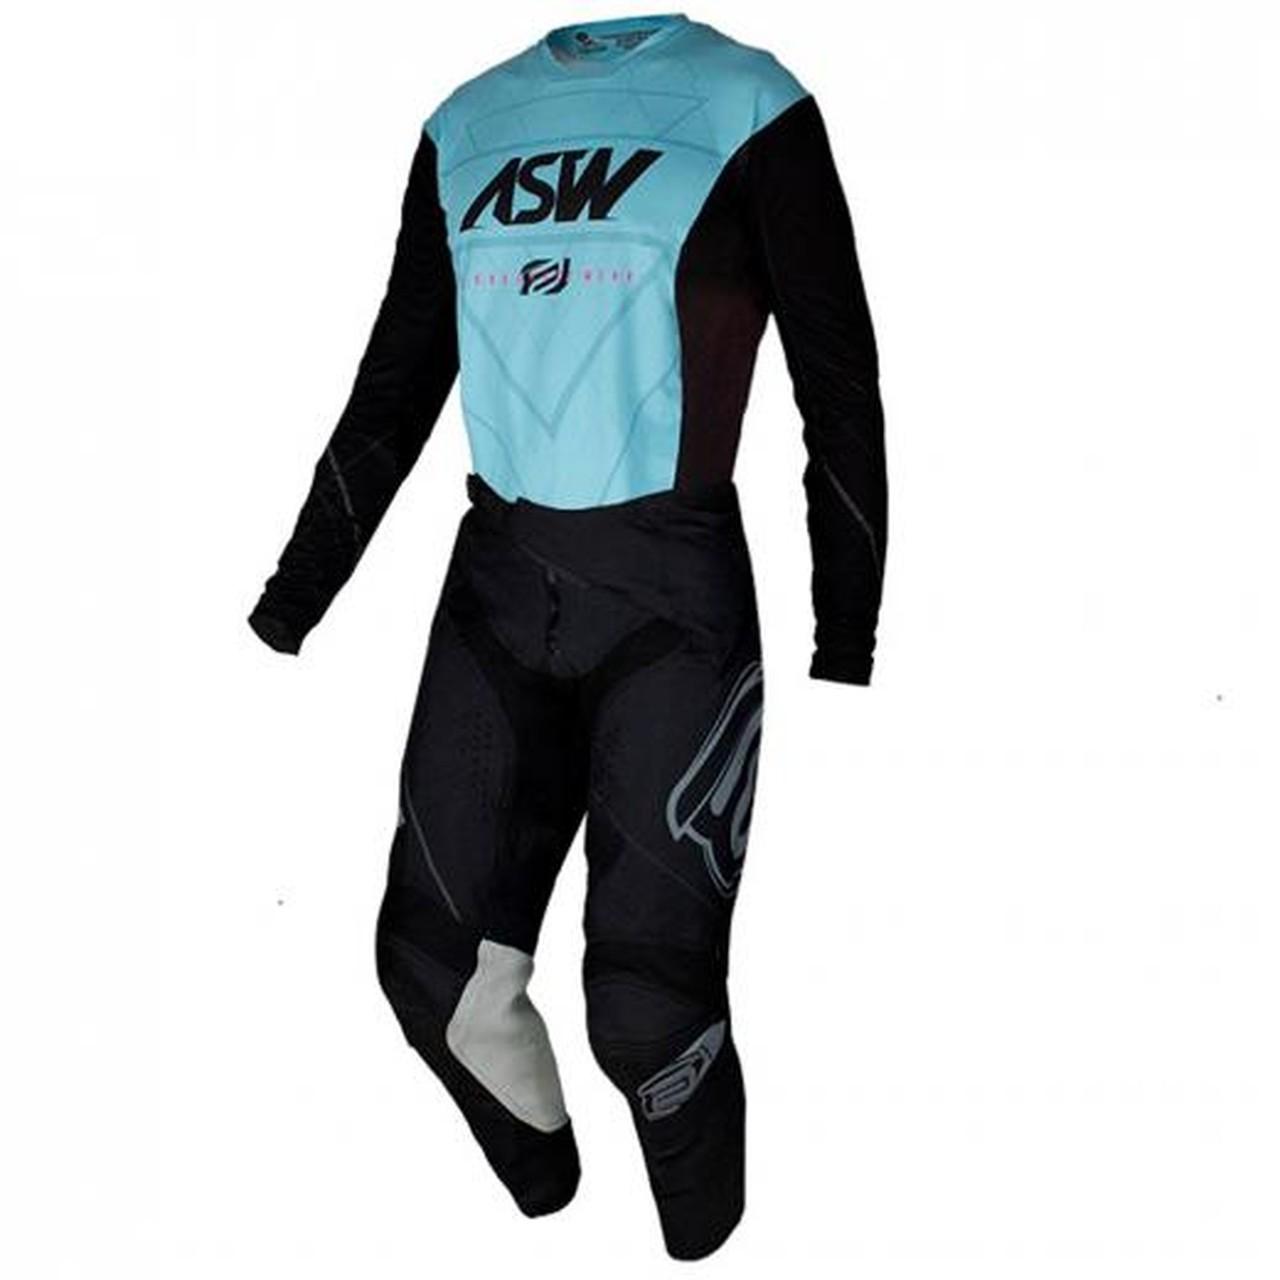 Kit Calça + Camisa ASW Podium Vertice Preto/Azul